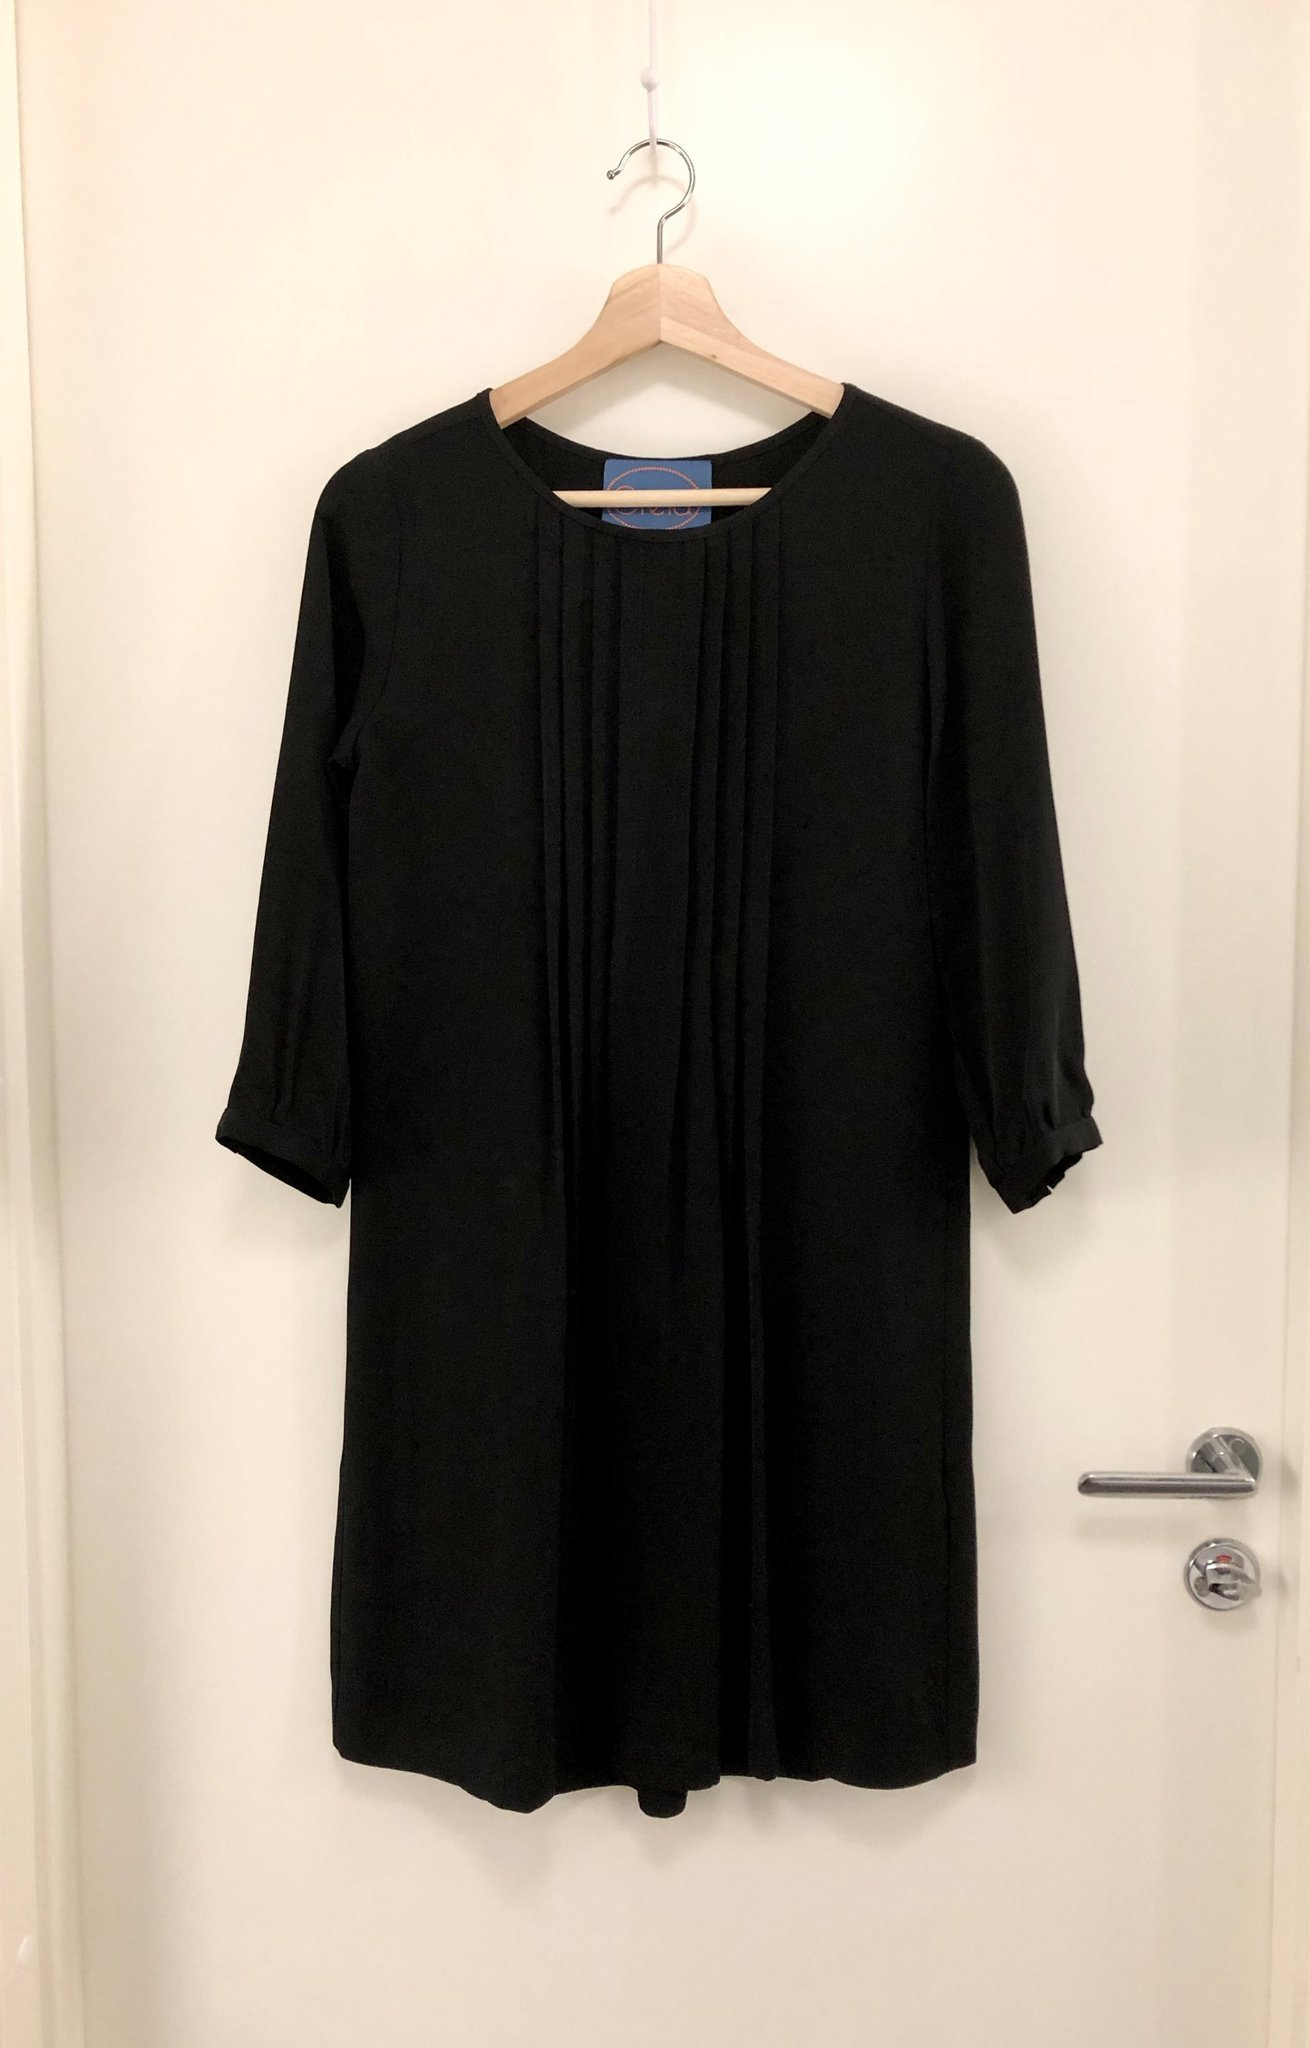 greta klänning josefine